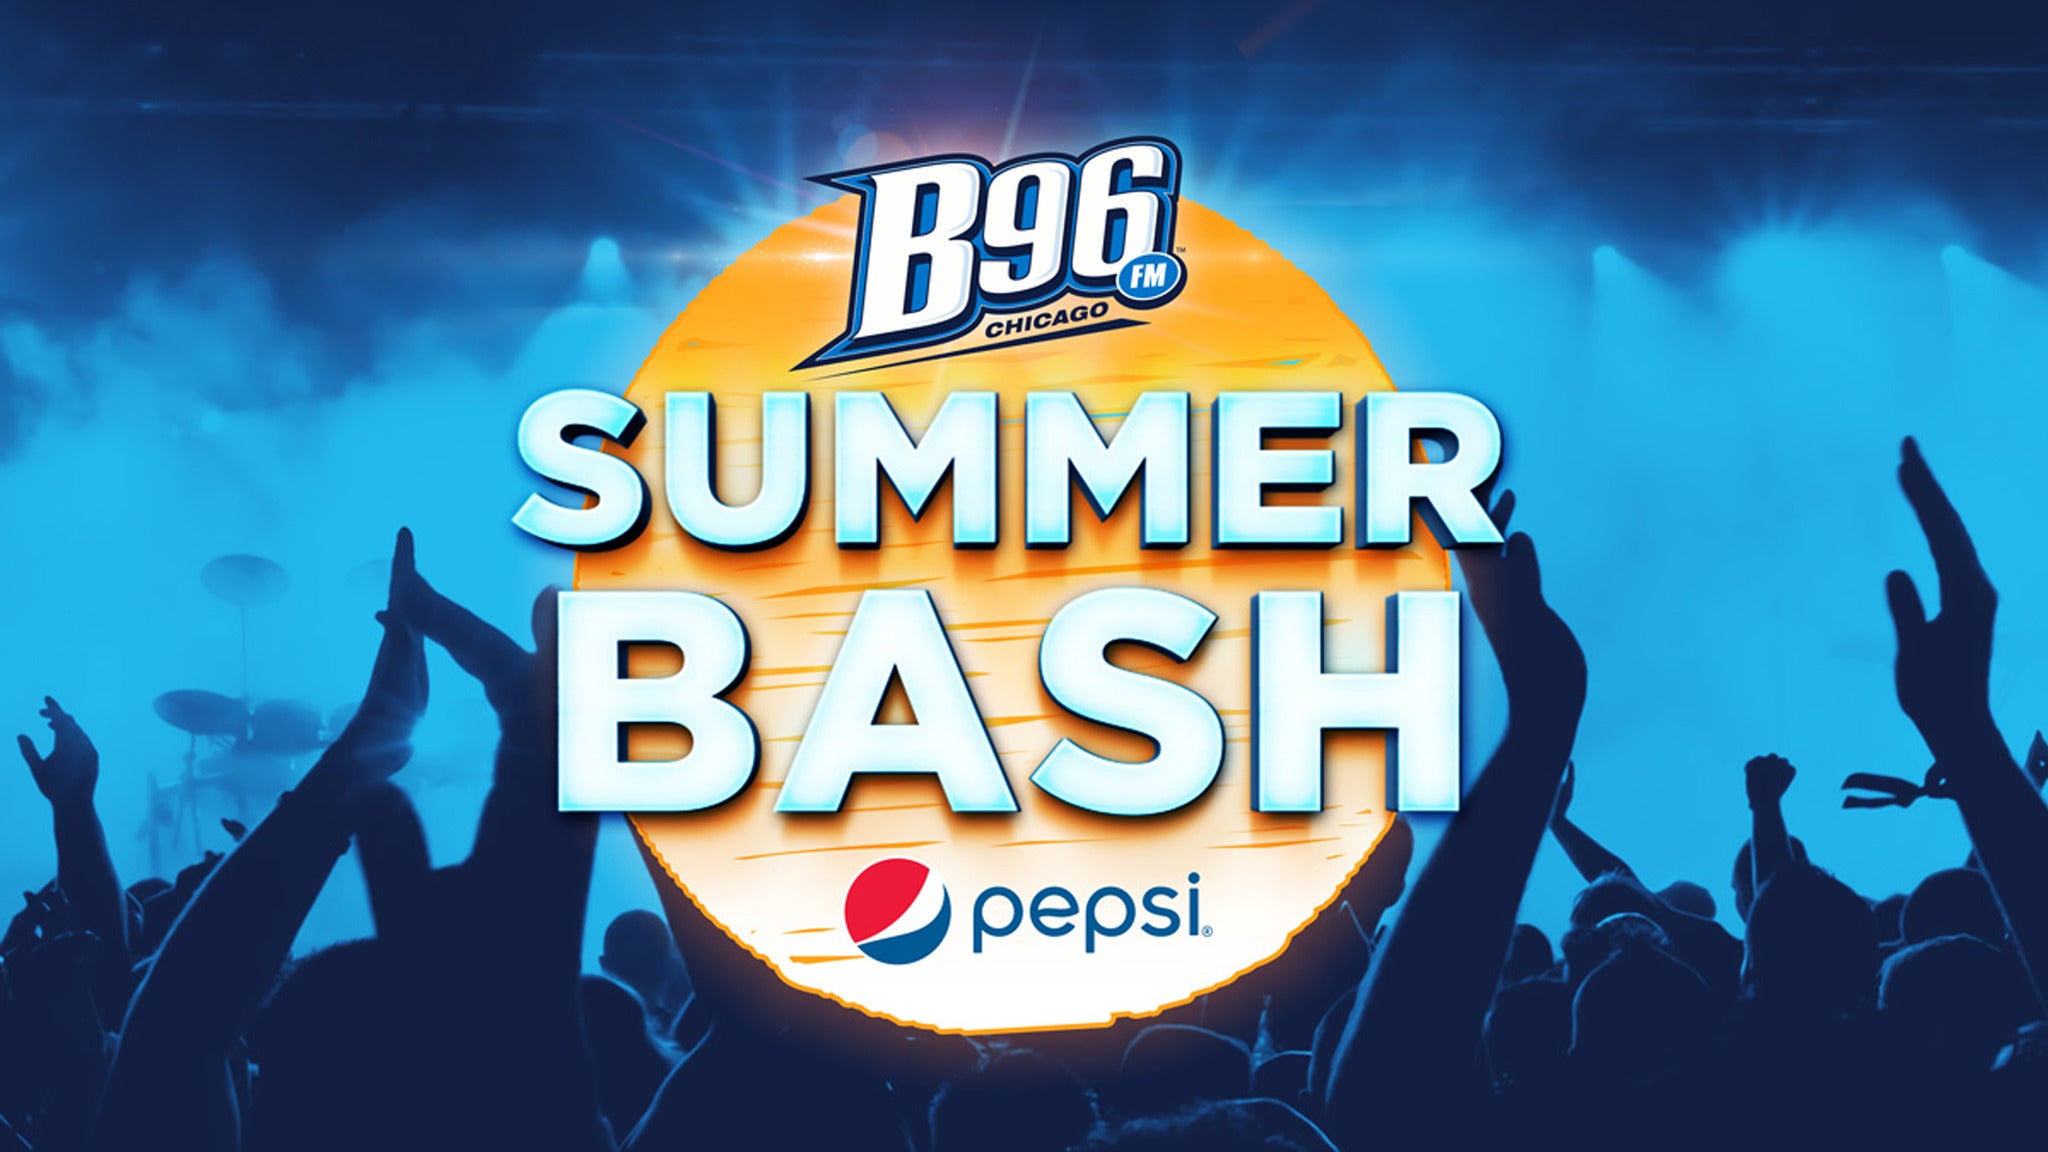 B96 Pepsi Summer Bash at Allstate Arena